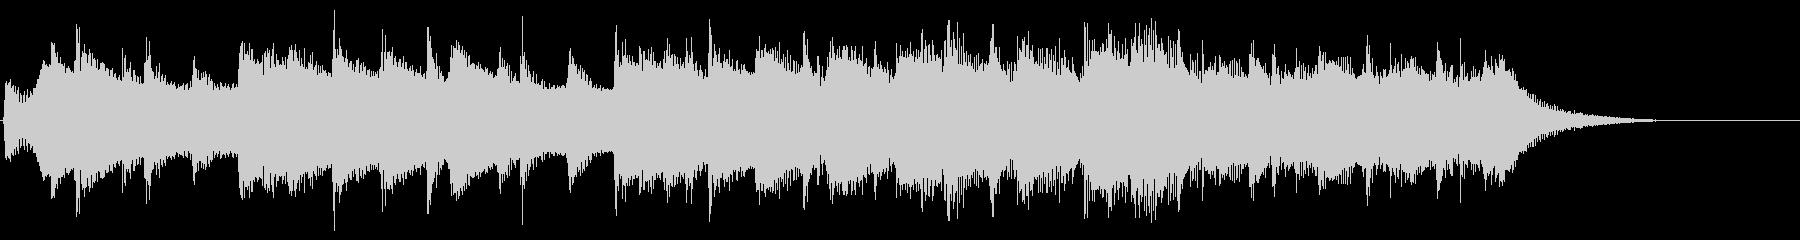 8bitジングル チップチューン場面転換の未再生の波形